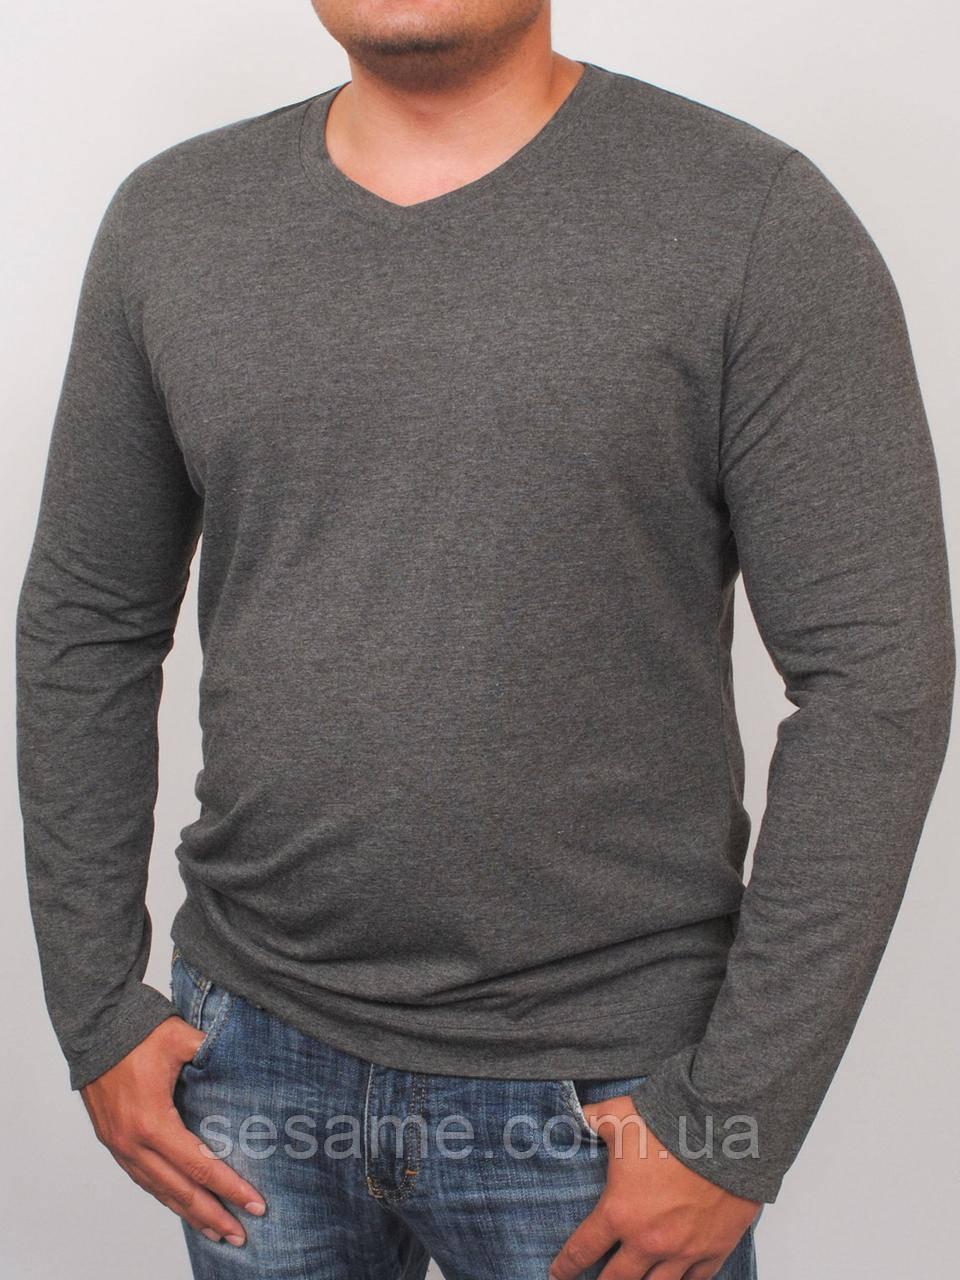 grand ua MEN LONG  футболка длинный рукав